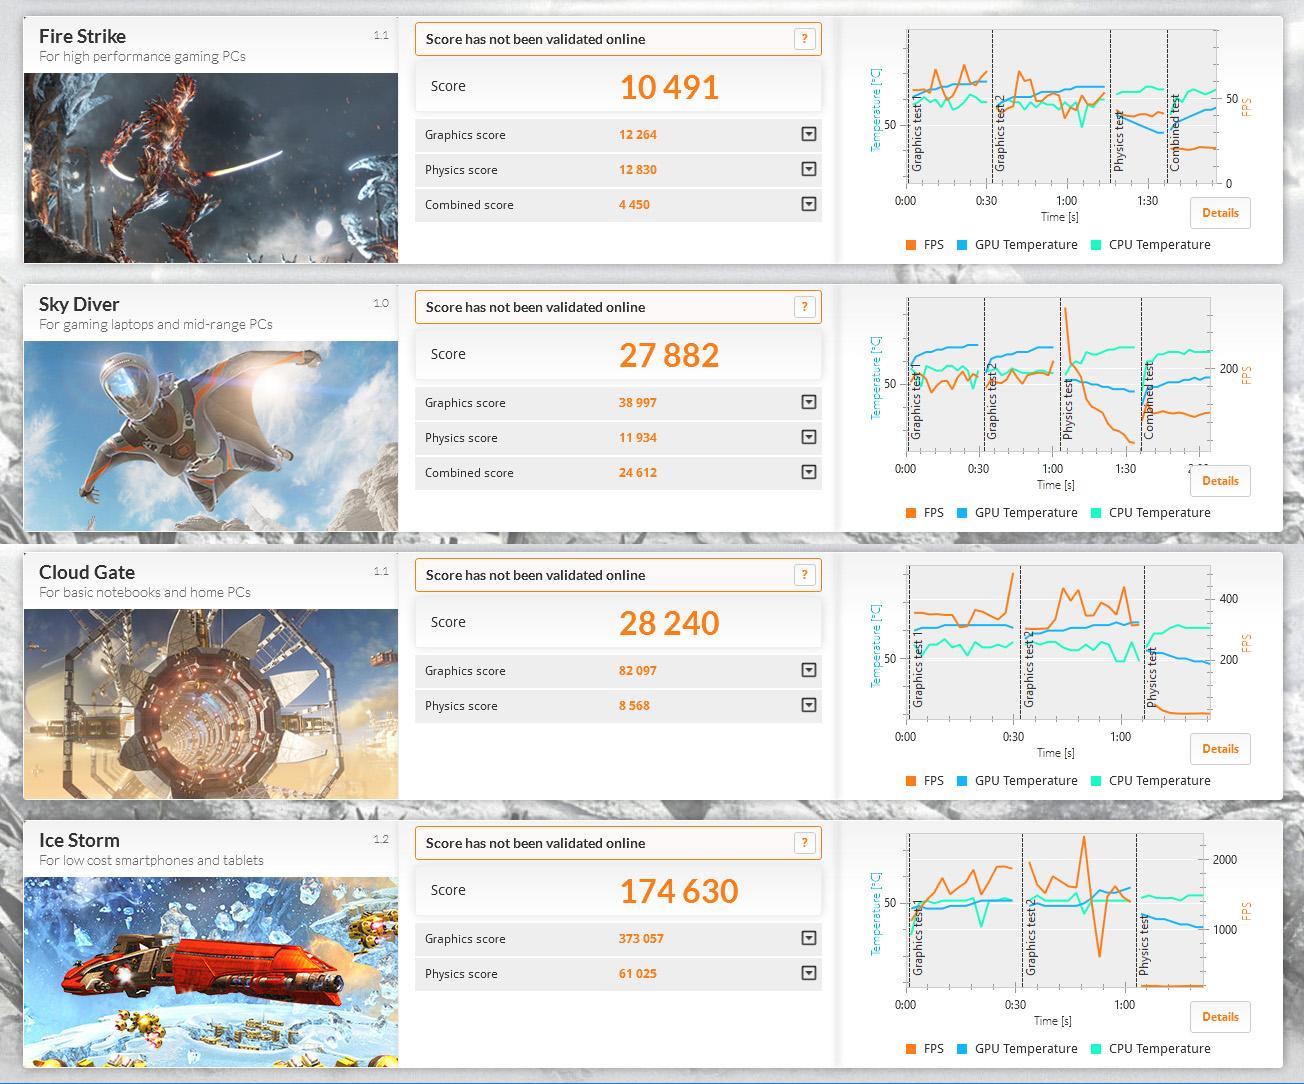 3DMarkのスコアは、Ice Storm 174,630、Cloud Gate 28,240、Sky Diver 27,882、Fire Strike 10,491